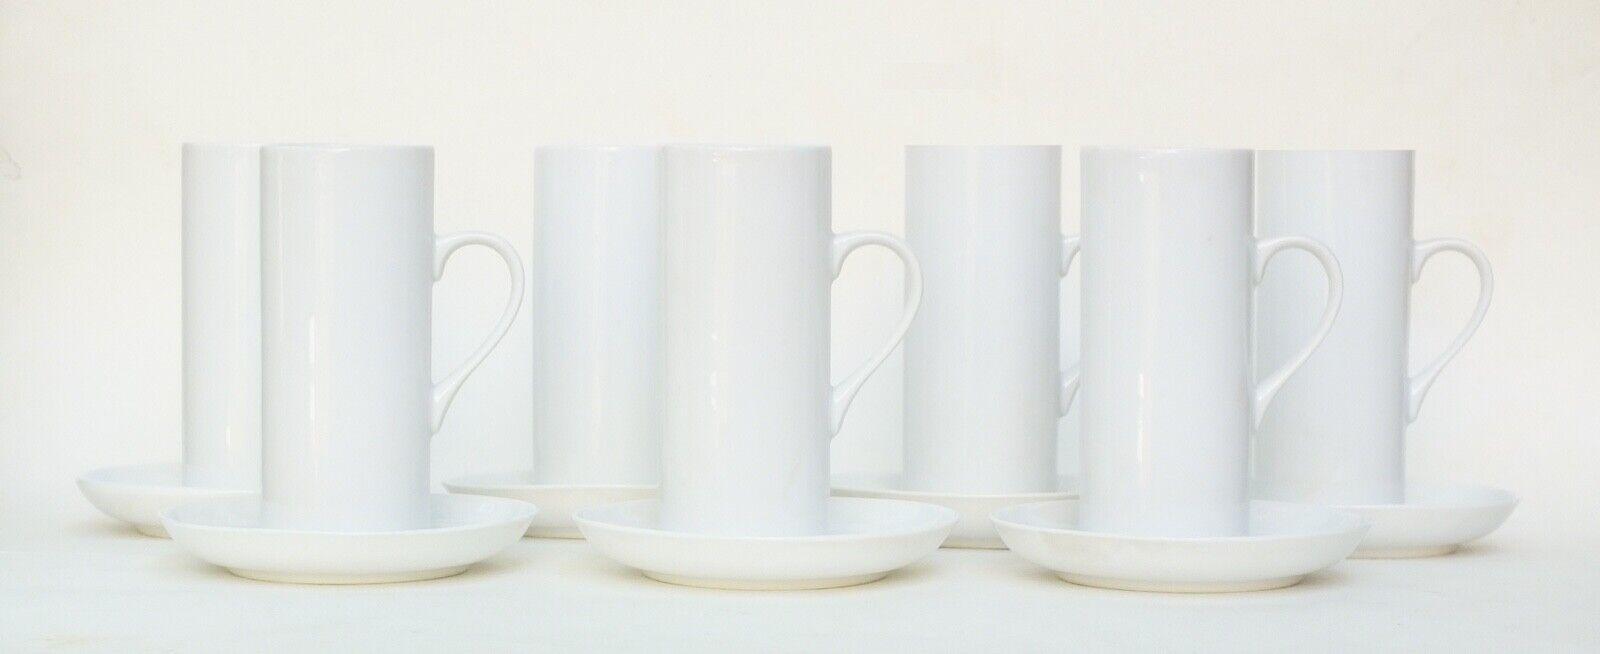 LaGardo Tackett Porcelain Irish Coffee Cups For Schmid International Japan 6  - $30.00